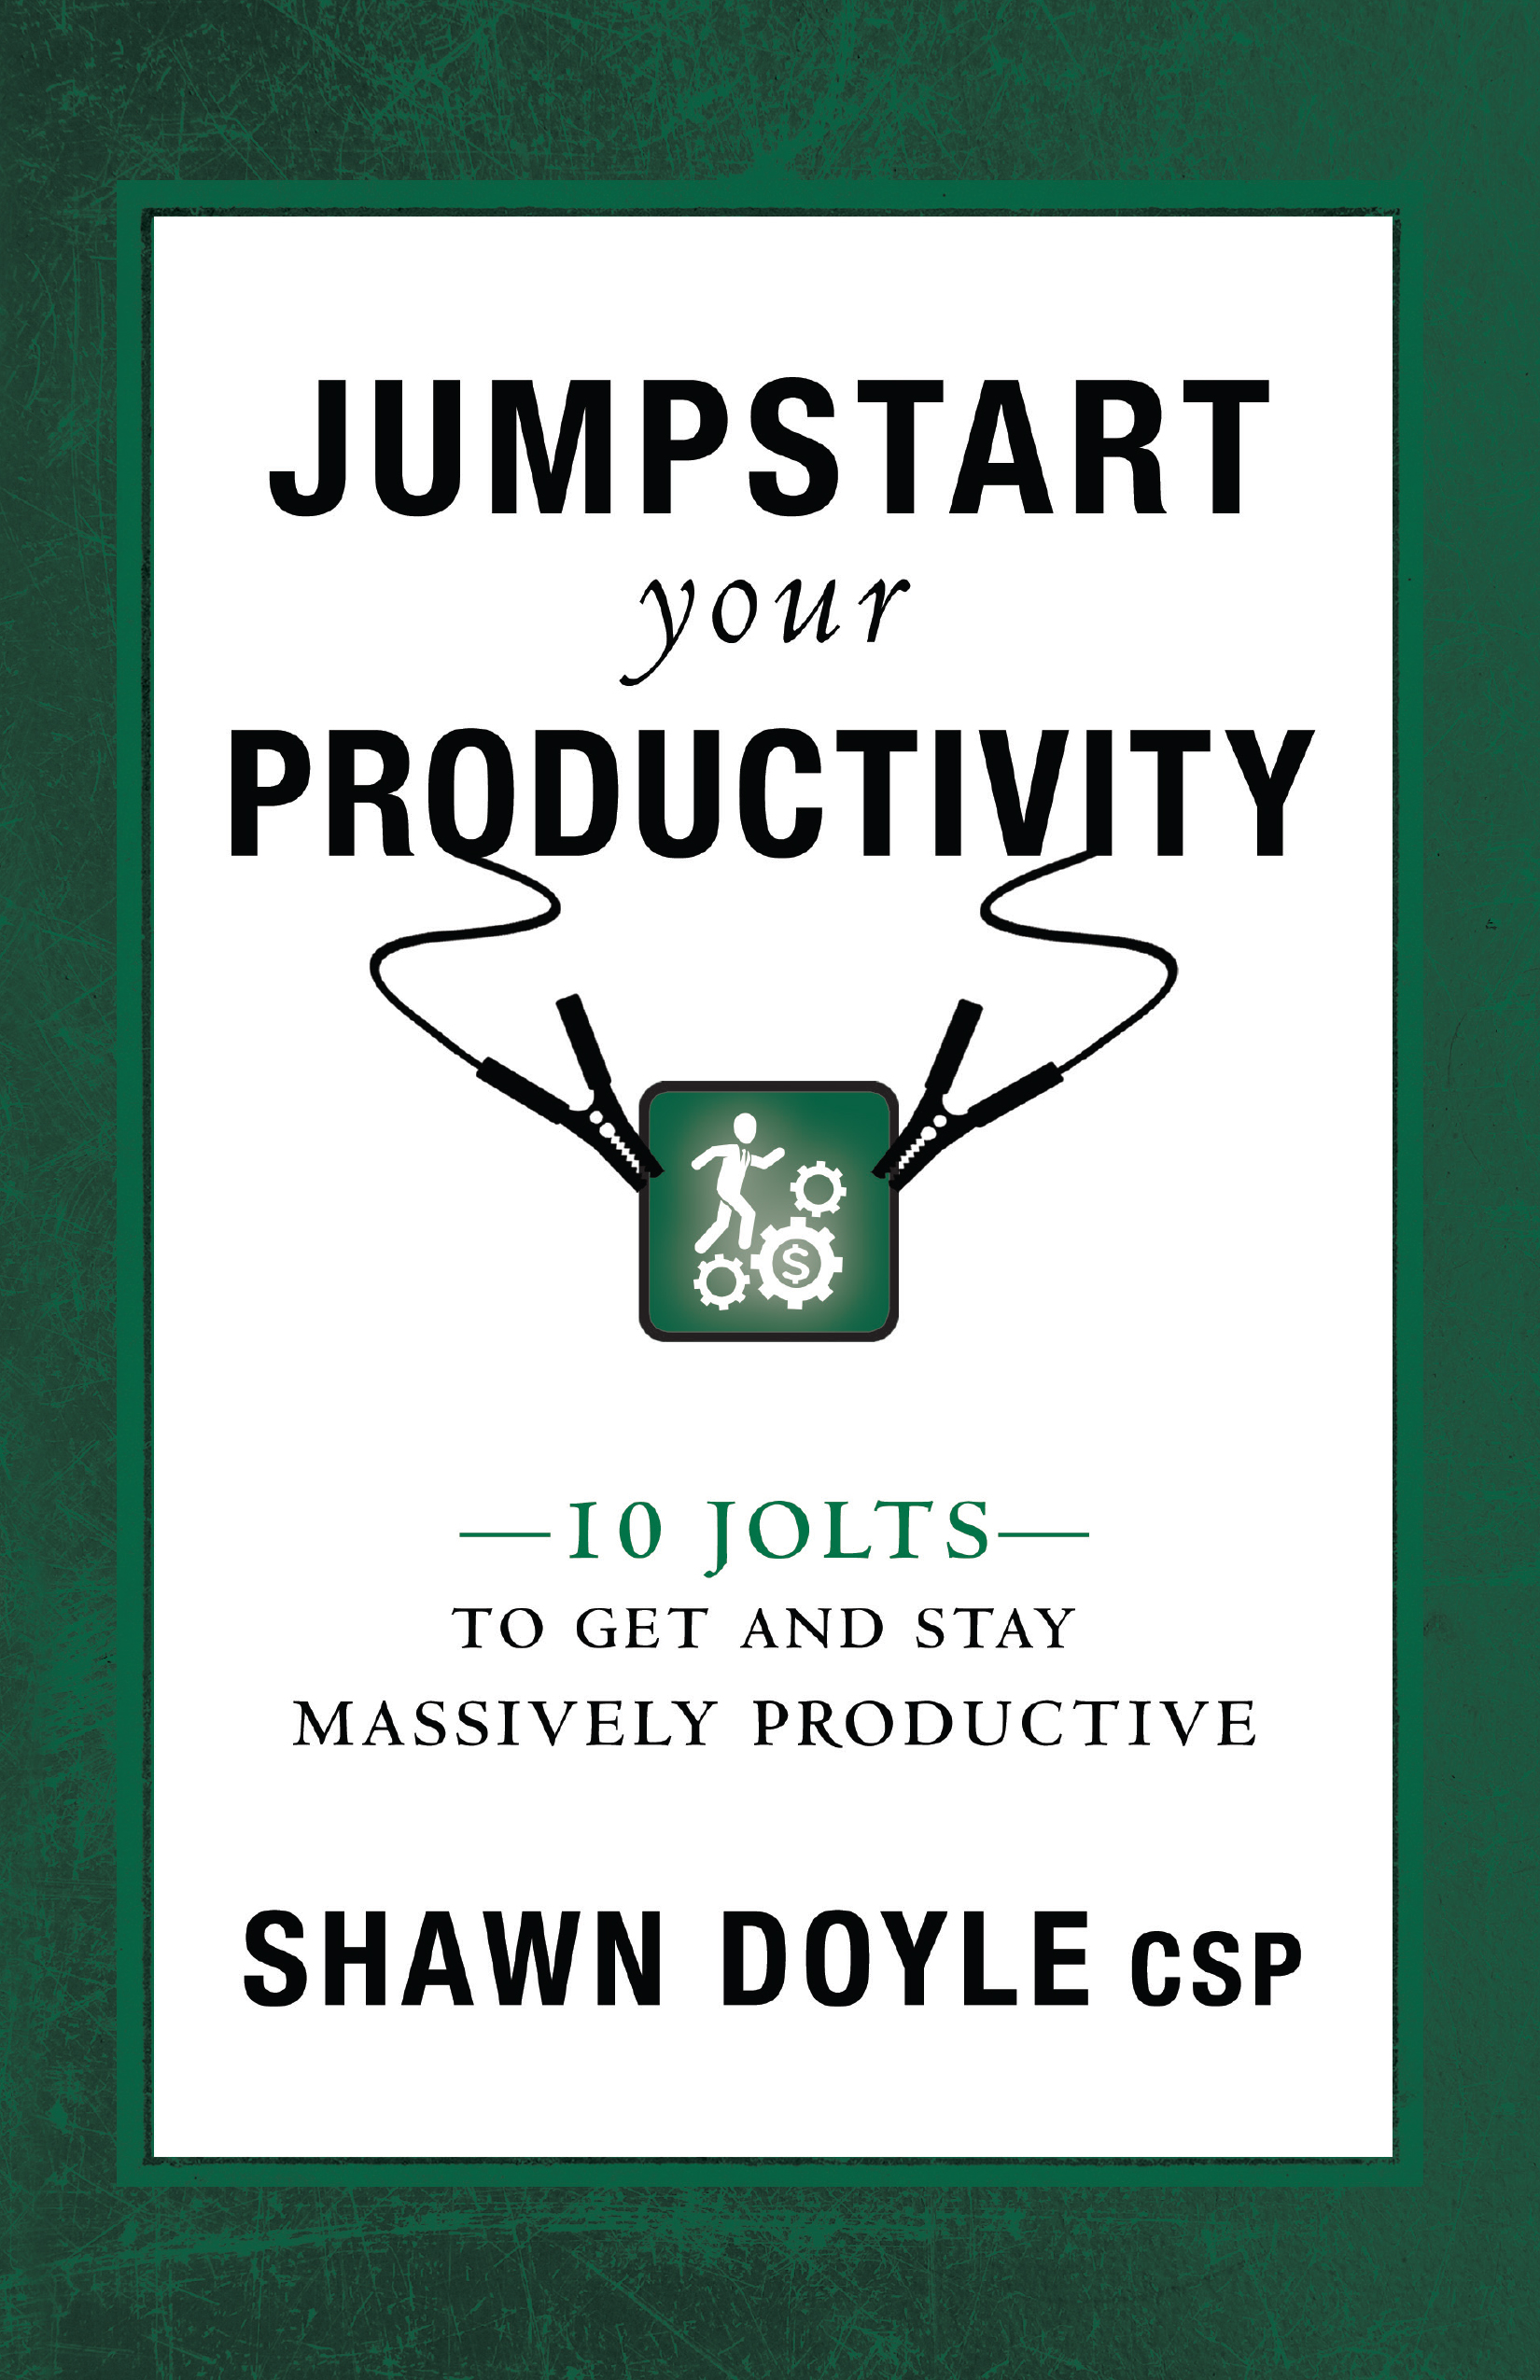 Jumpstart Your Productivity - Shawn Doyle CSP